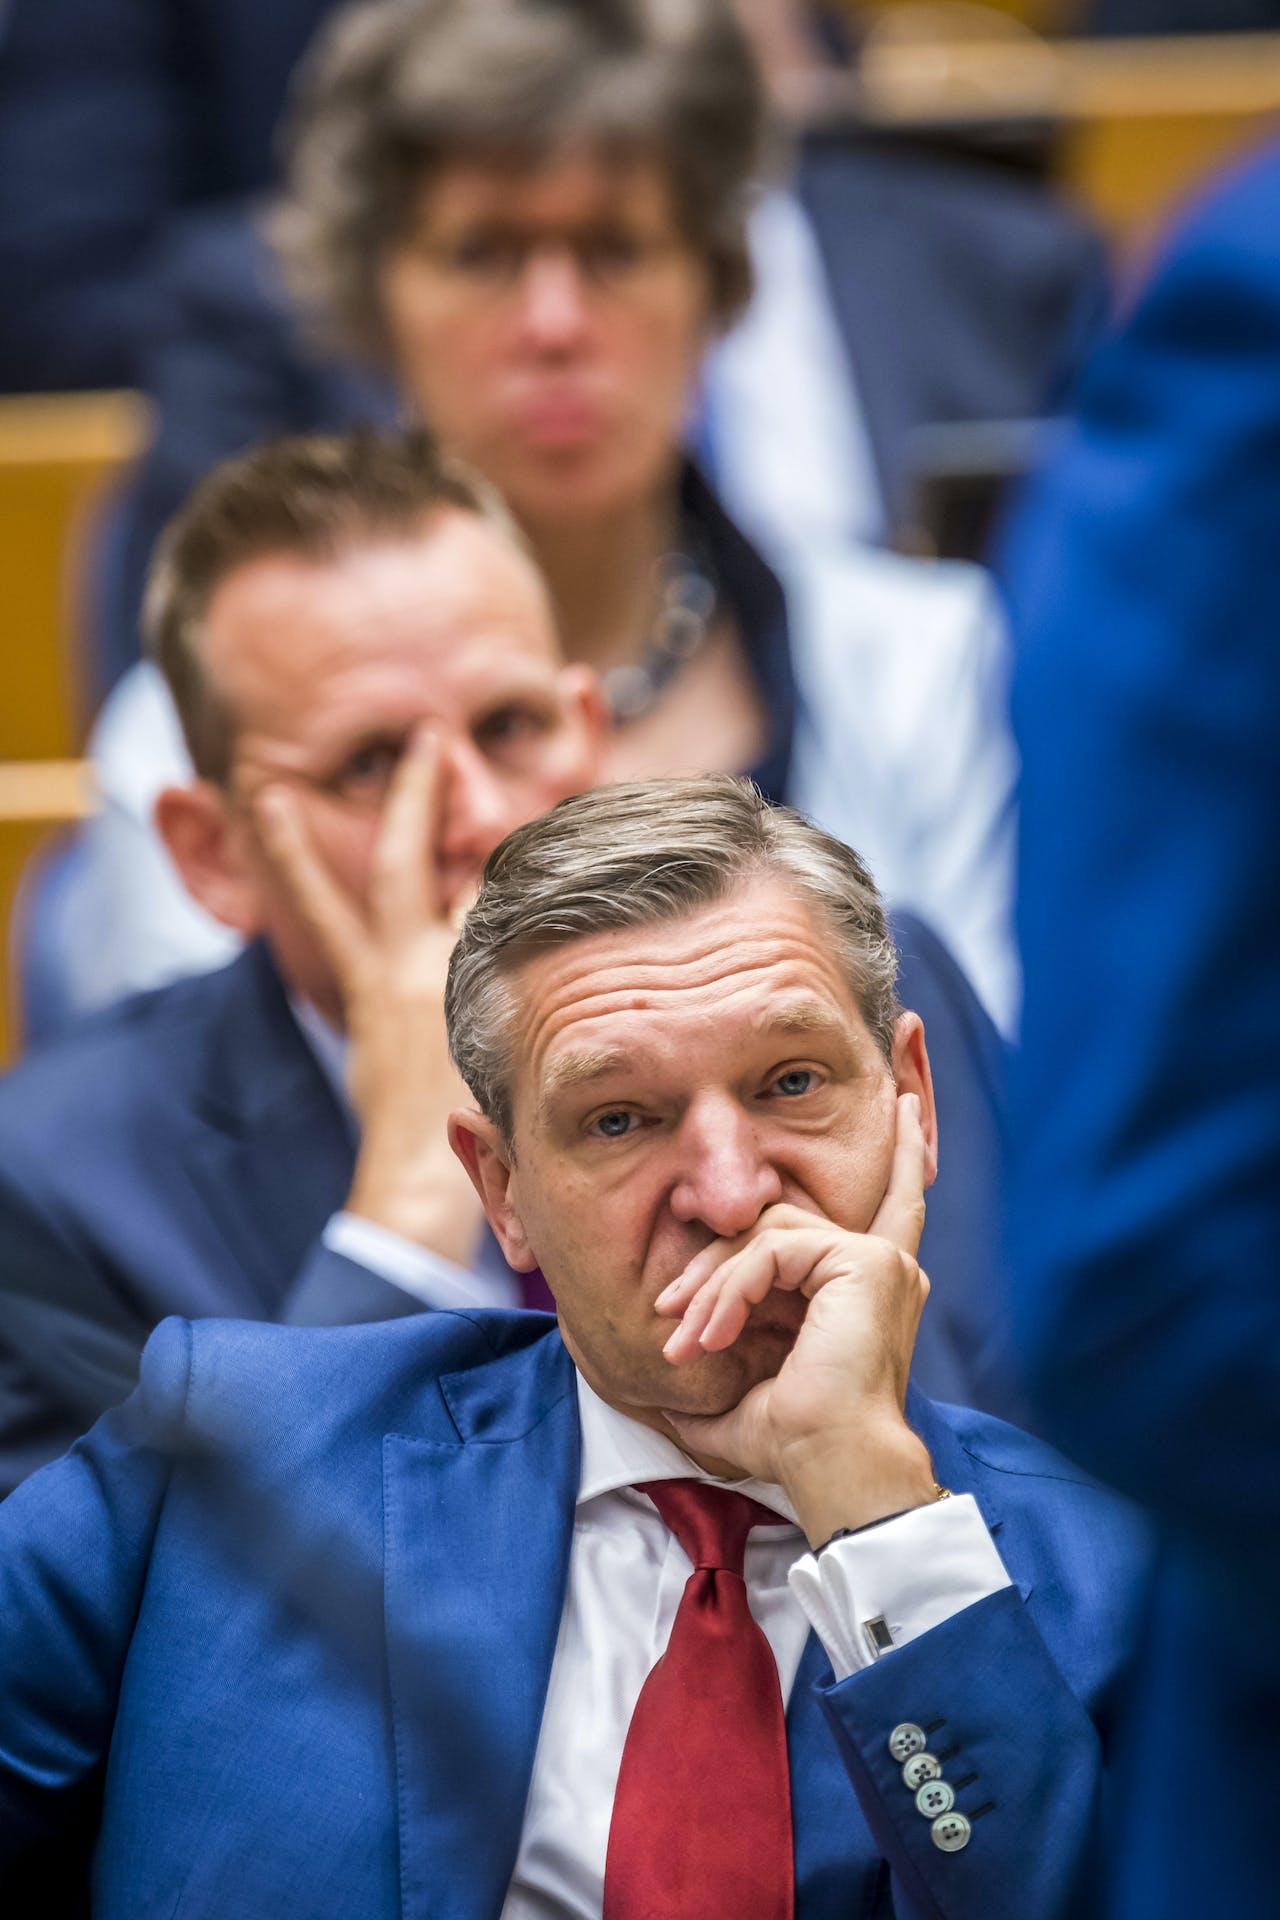 CDA-leider Sybrand van Haersma Buma